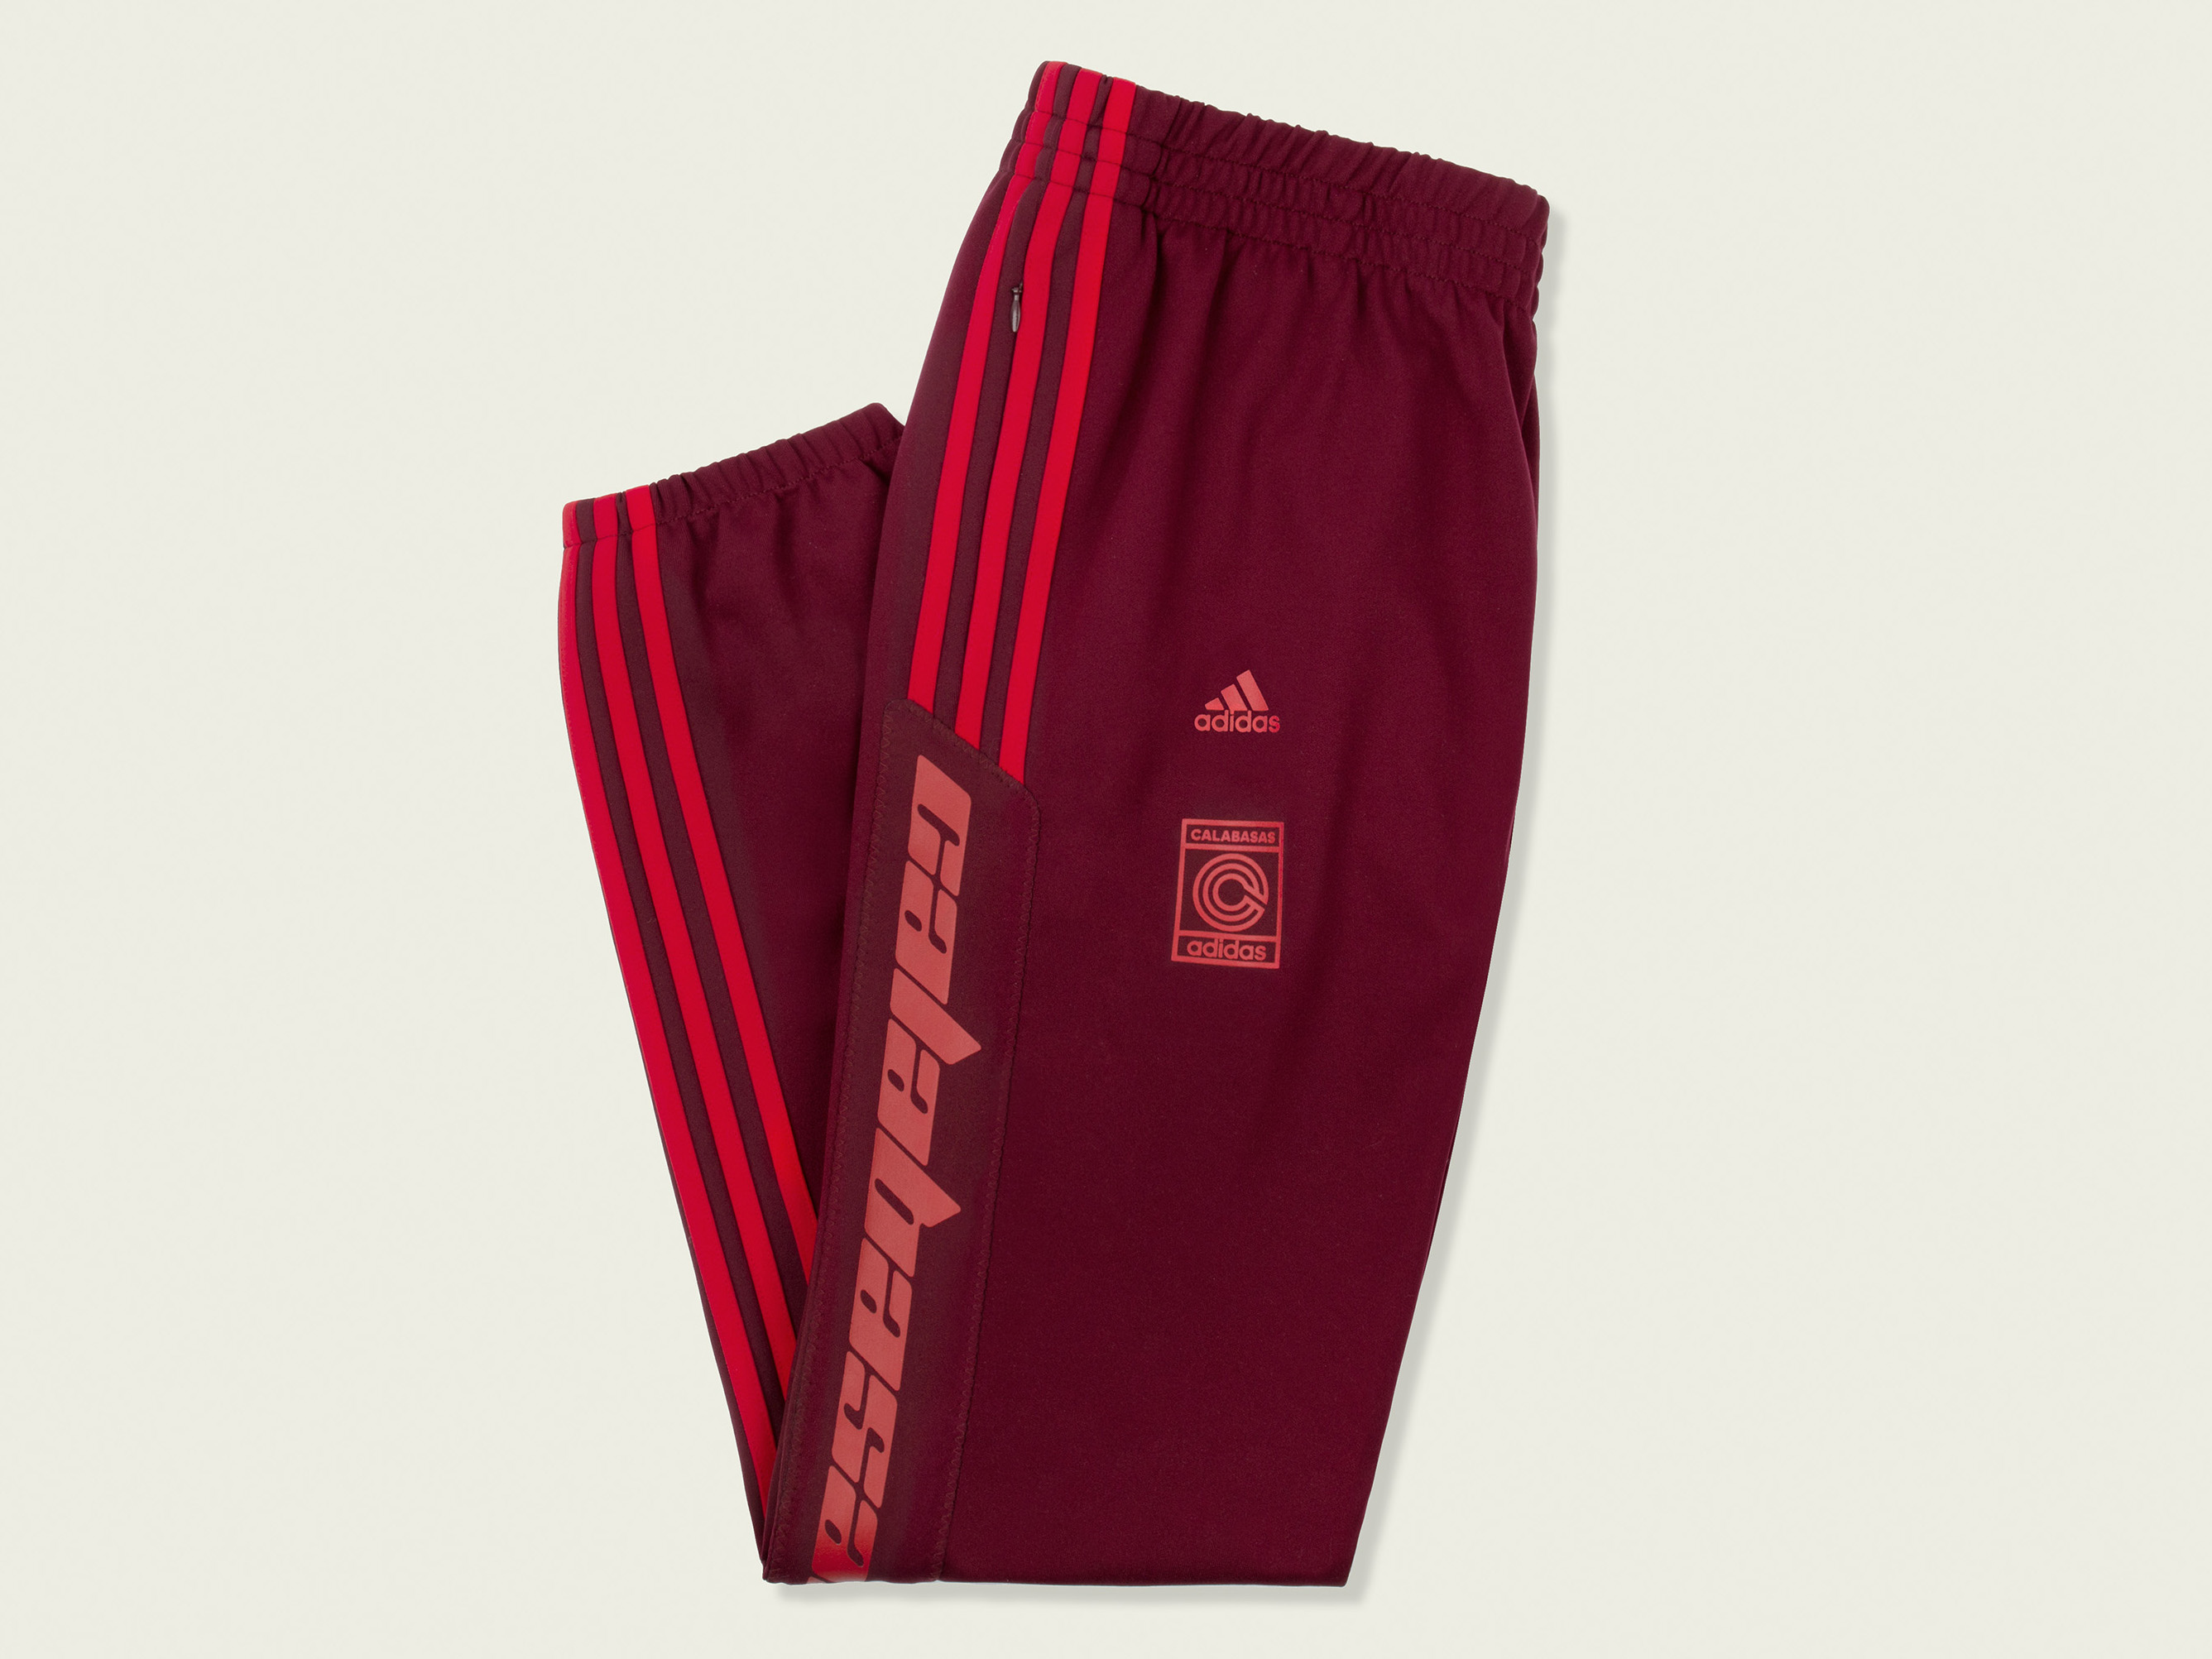 YEEZY Calabasas Track Pants MAROON XS